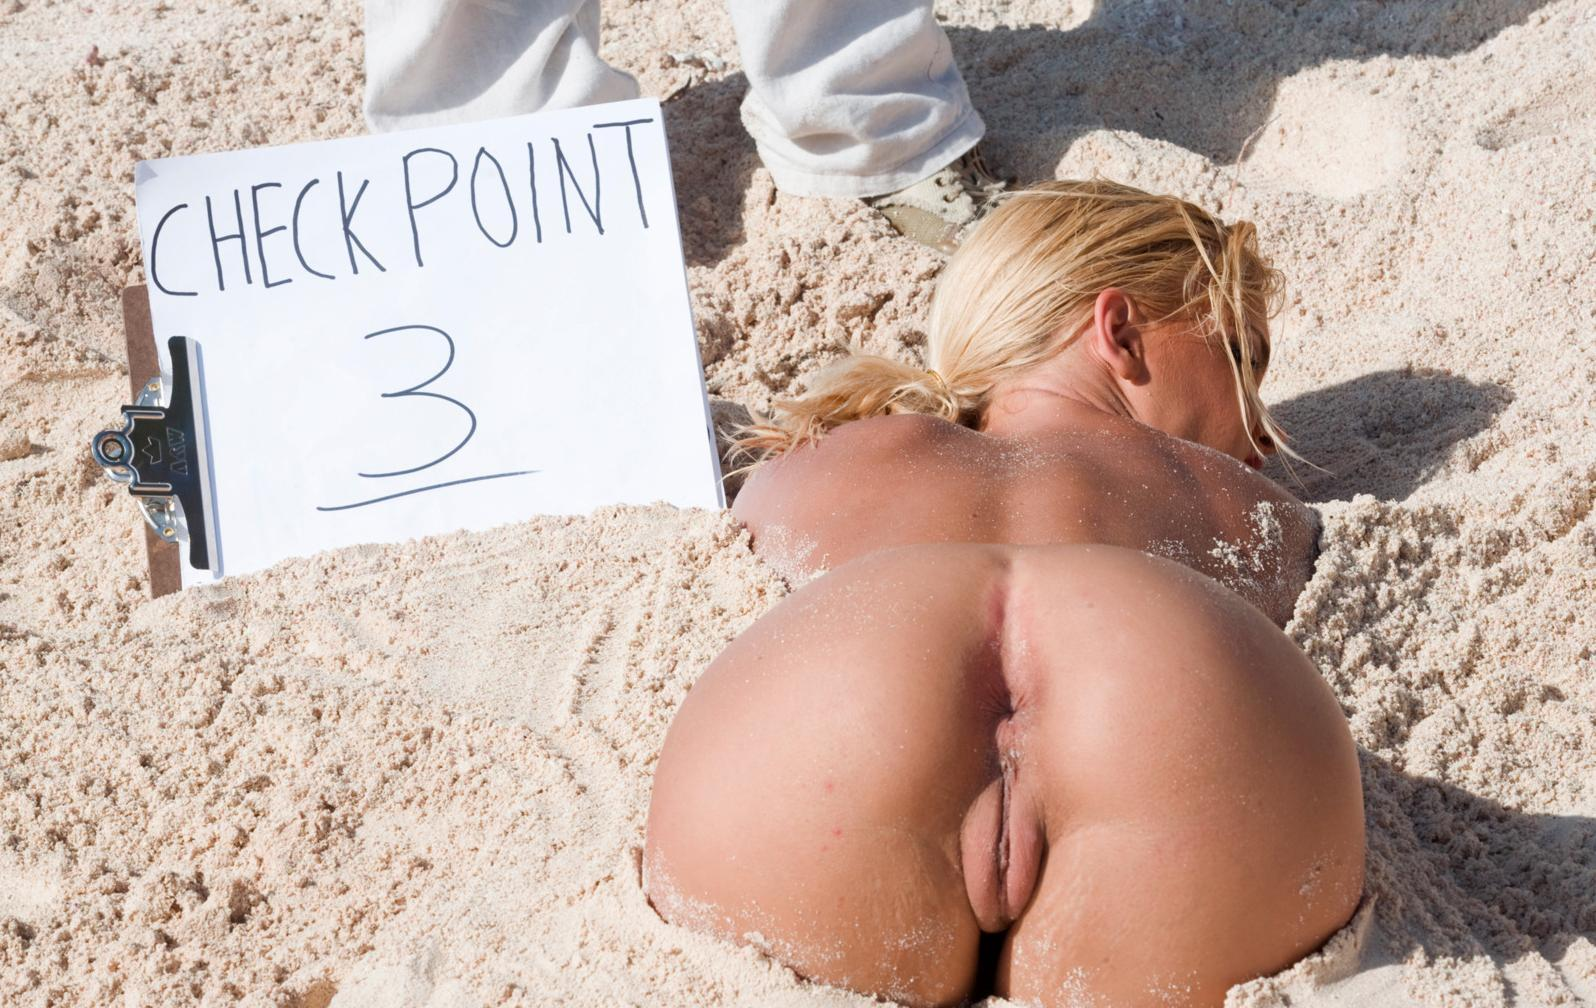 Consider, nude beach on assholes situation familiar